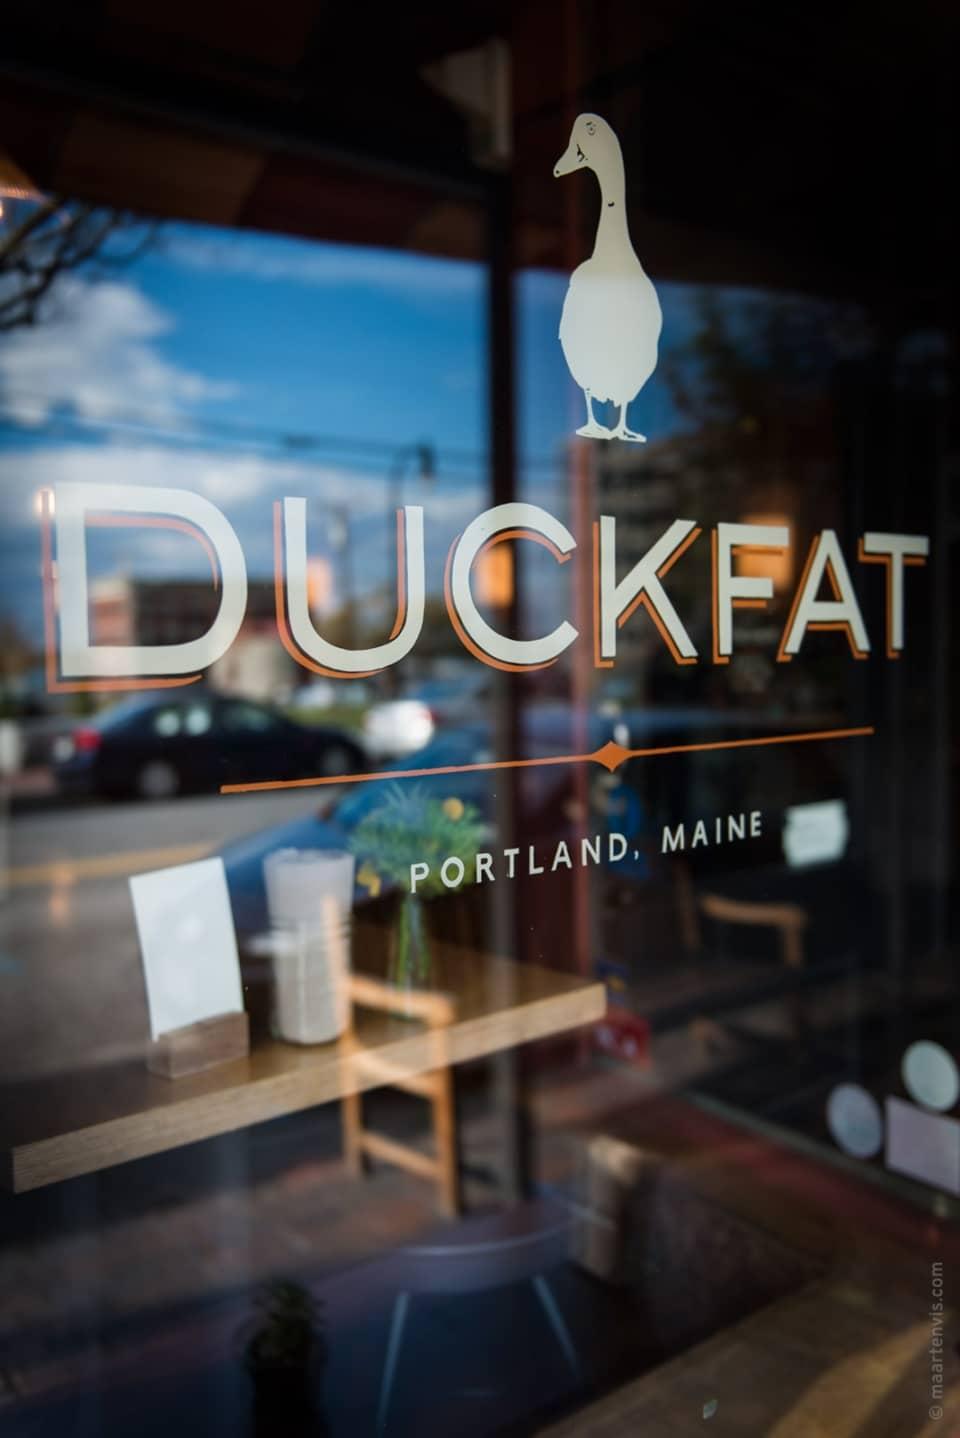 20131027 5392 960x1438 - Portland Restaurants - Our Top Three